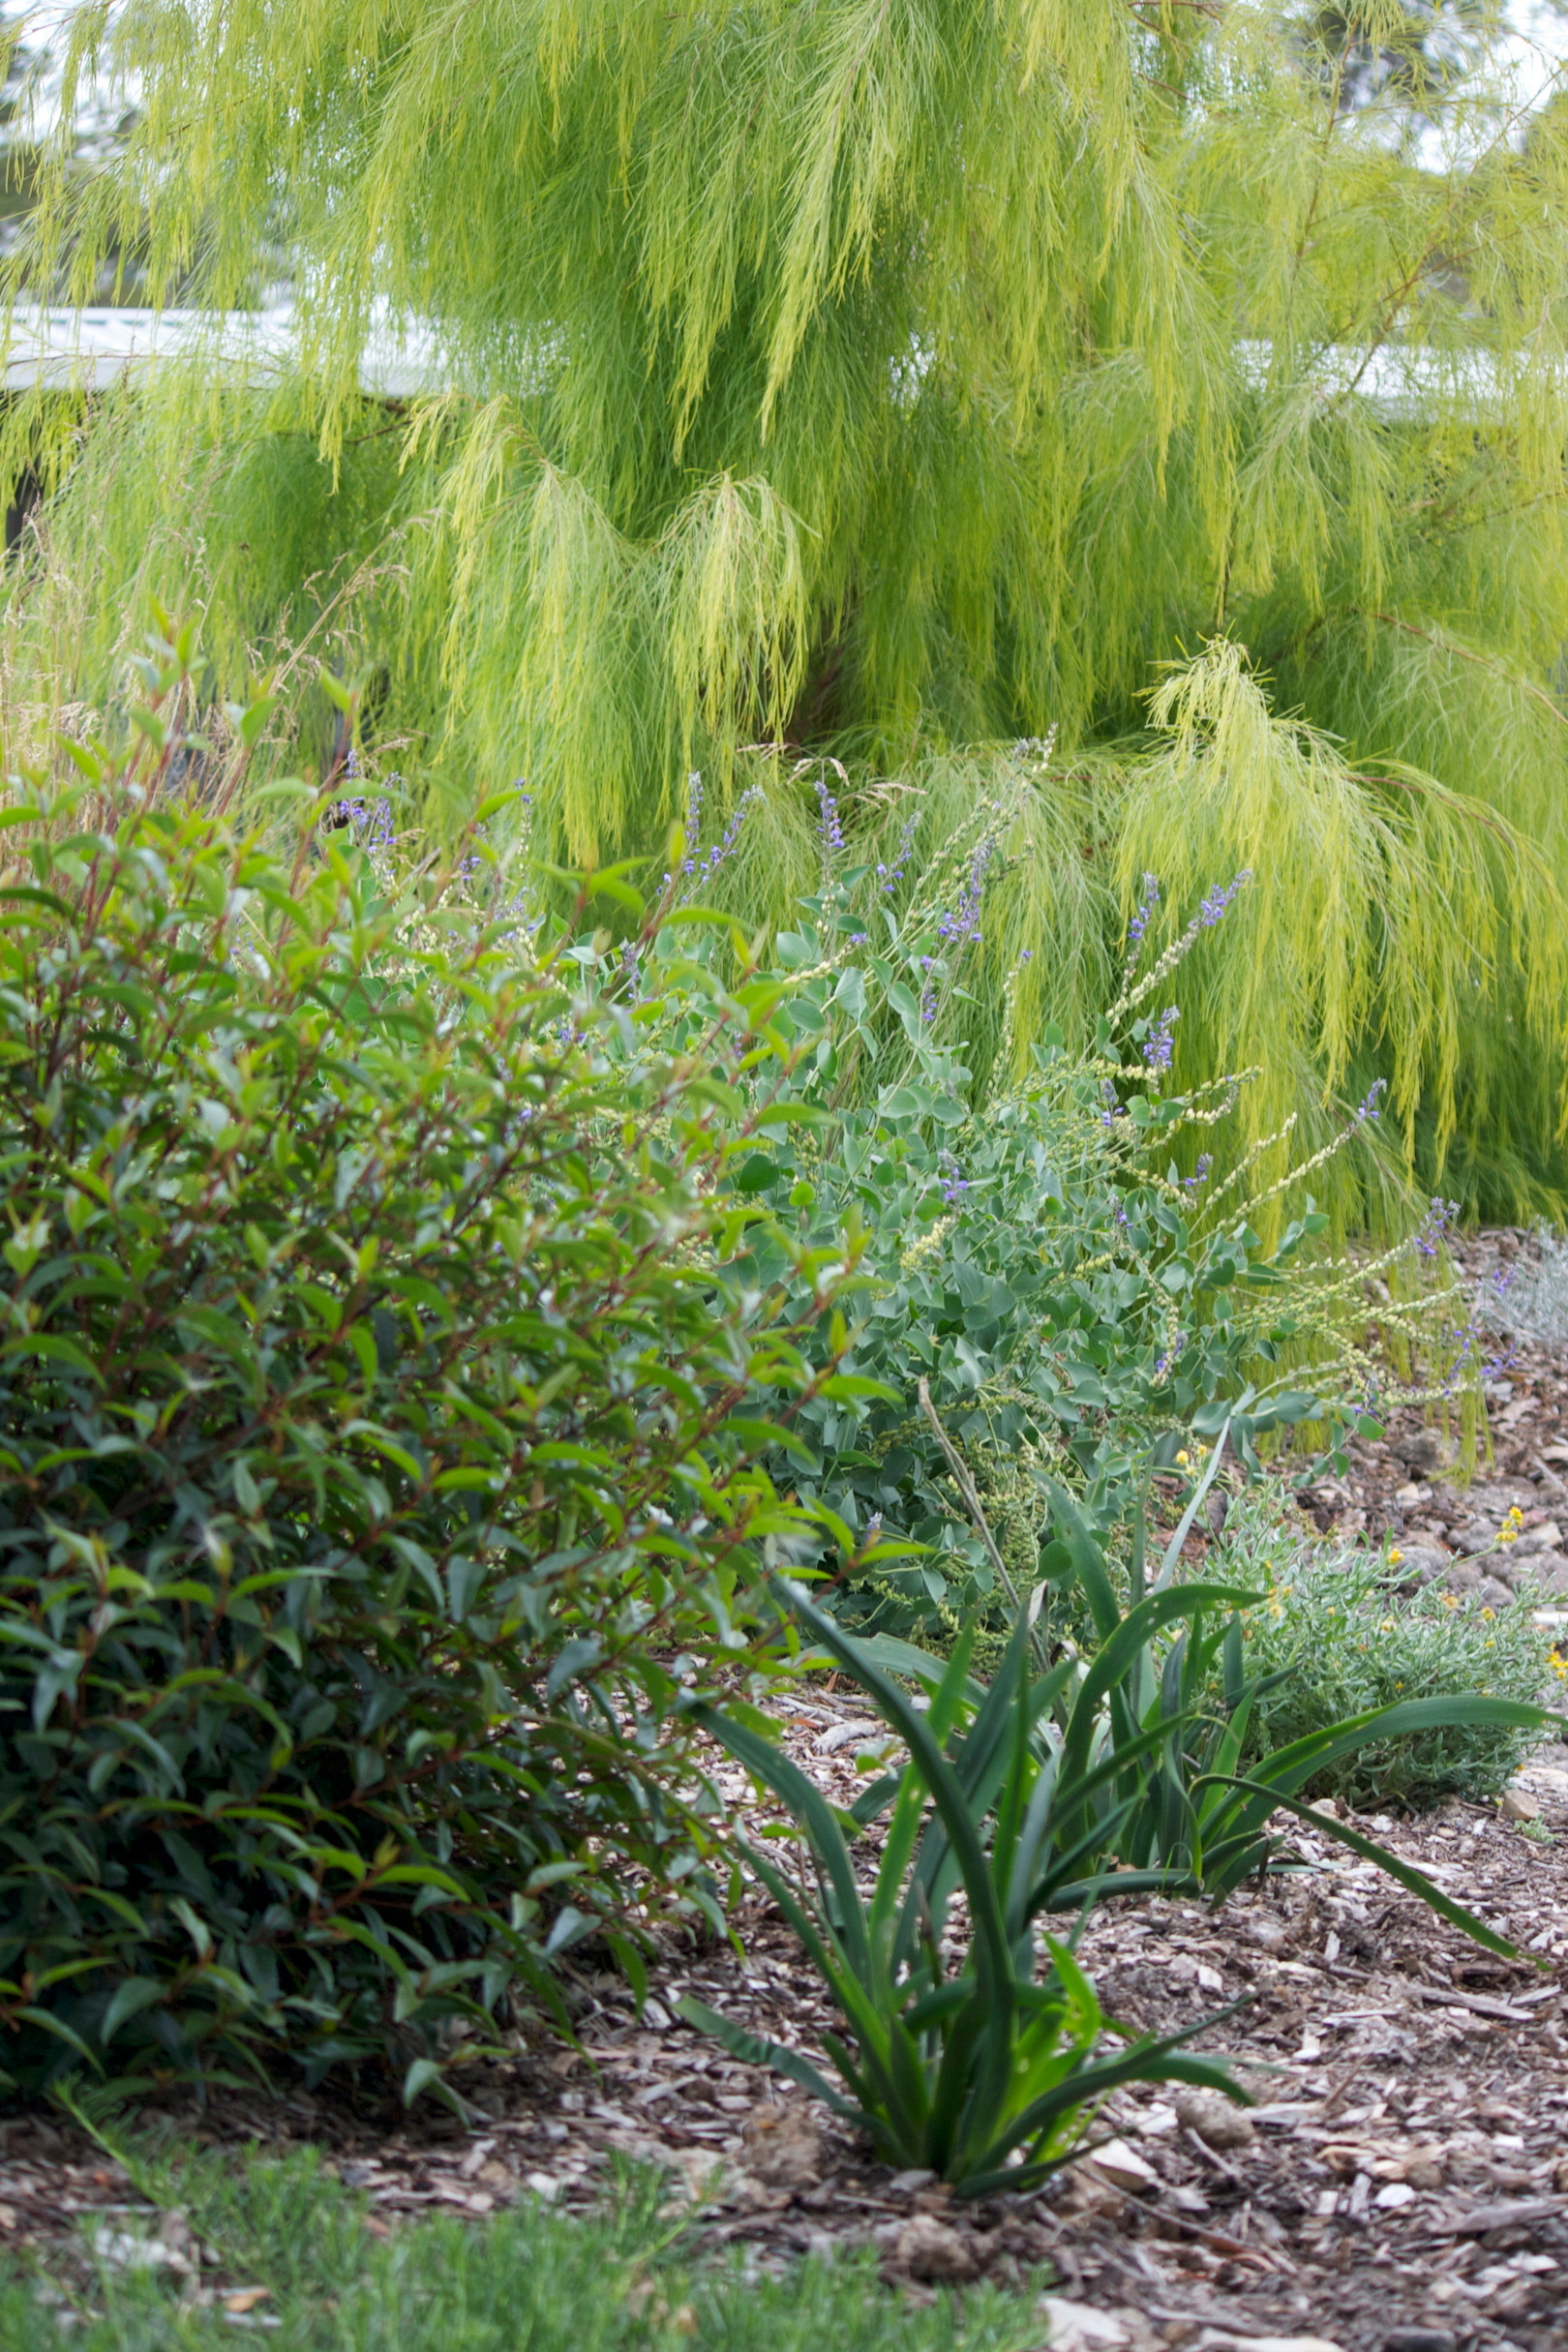 Garden inspiration consult